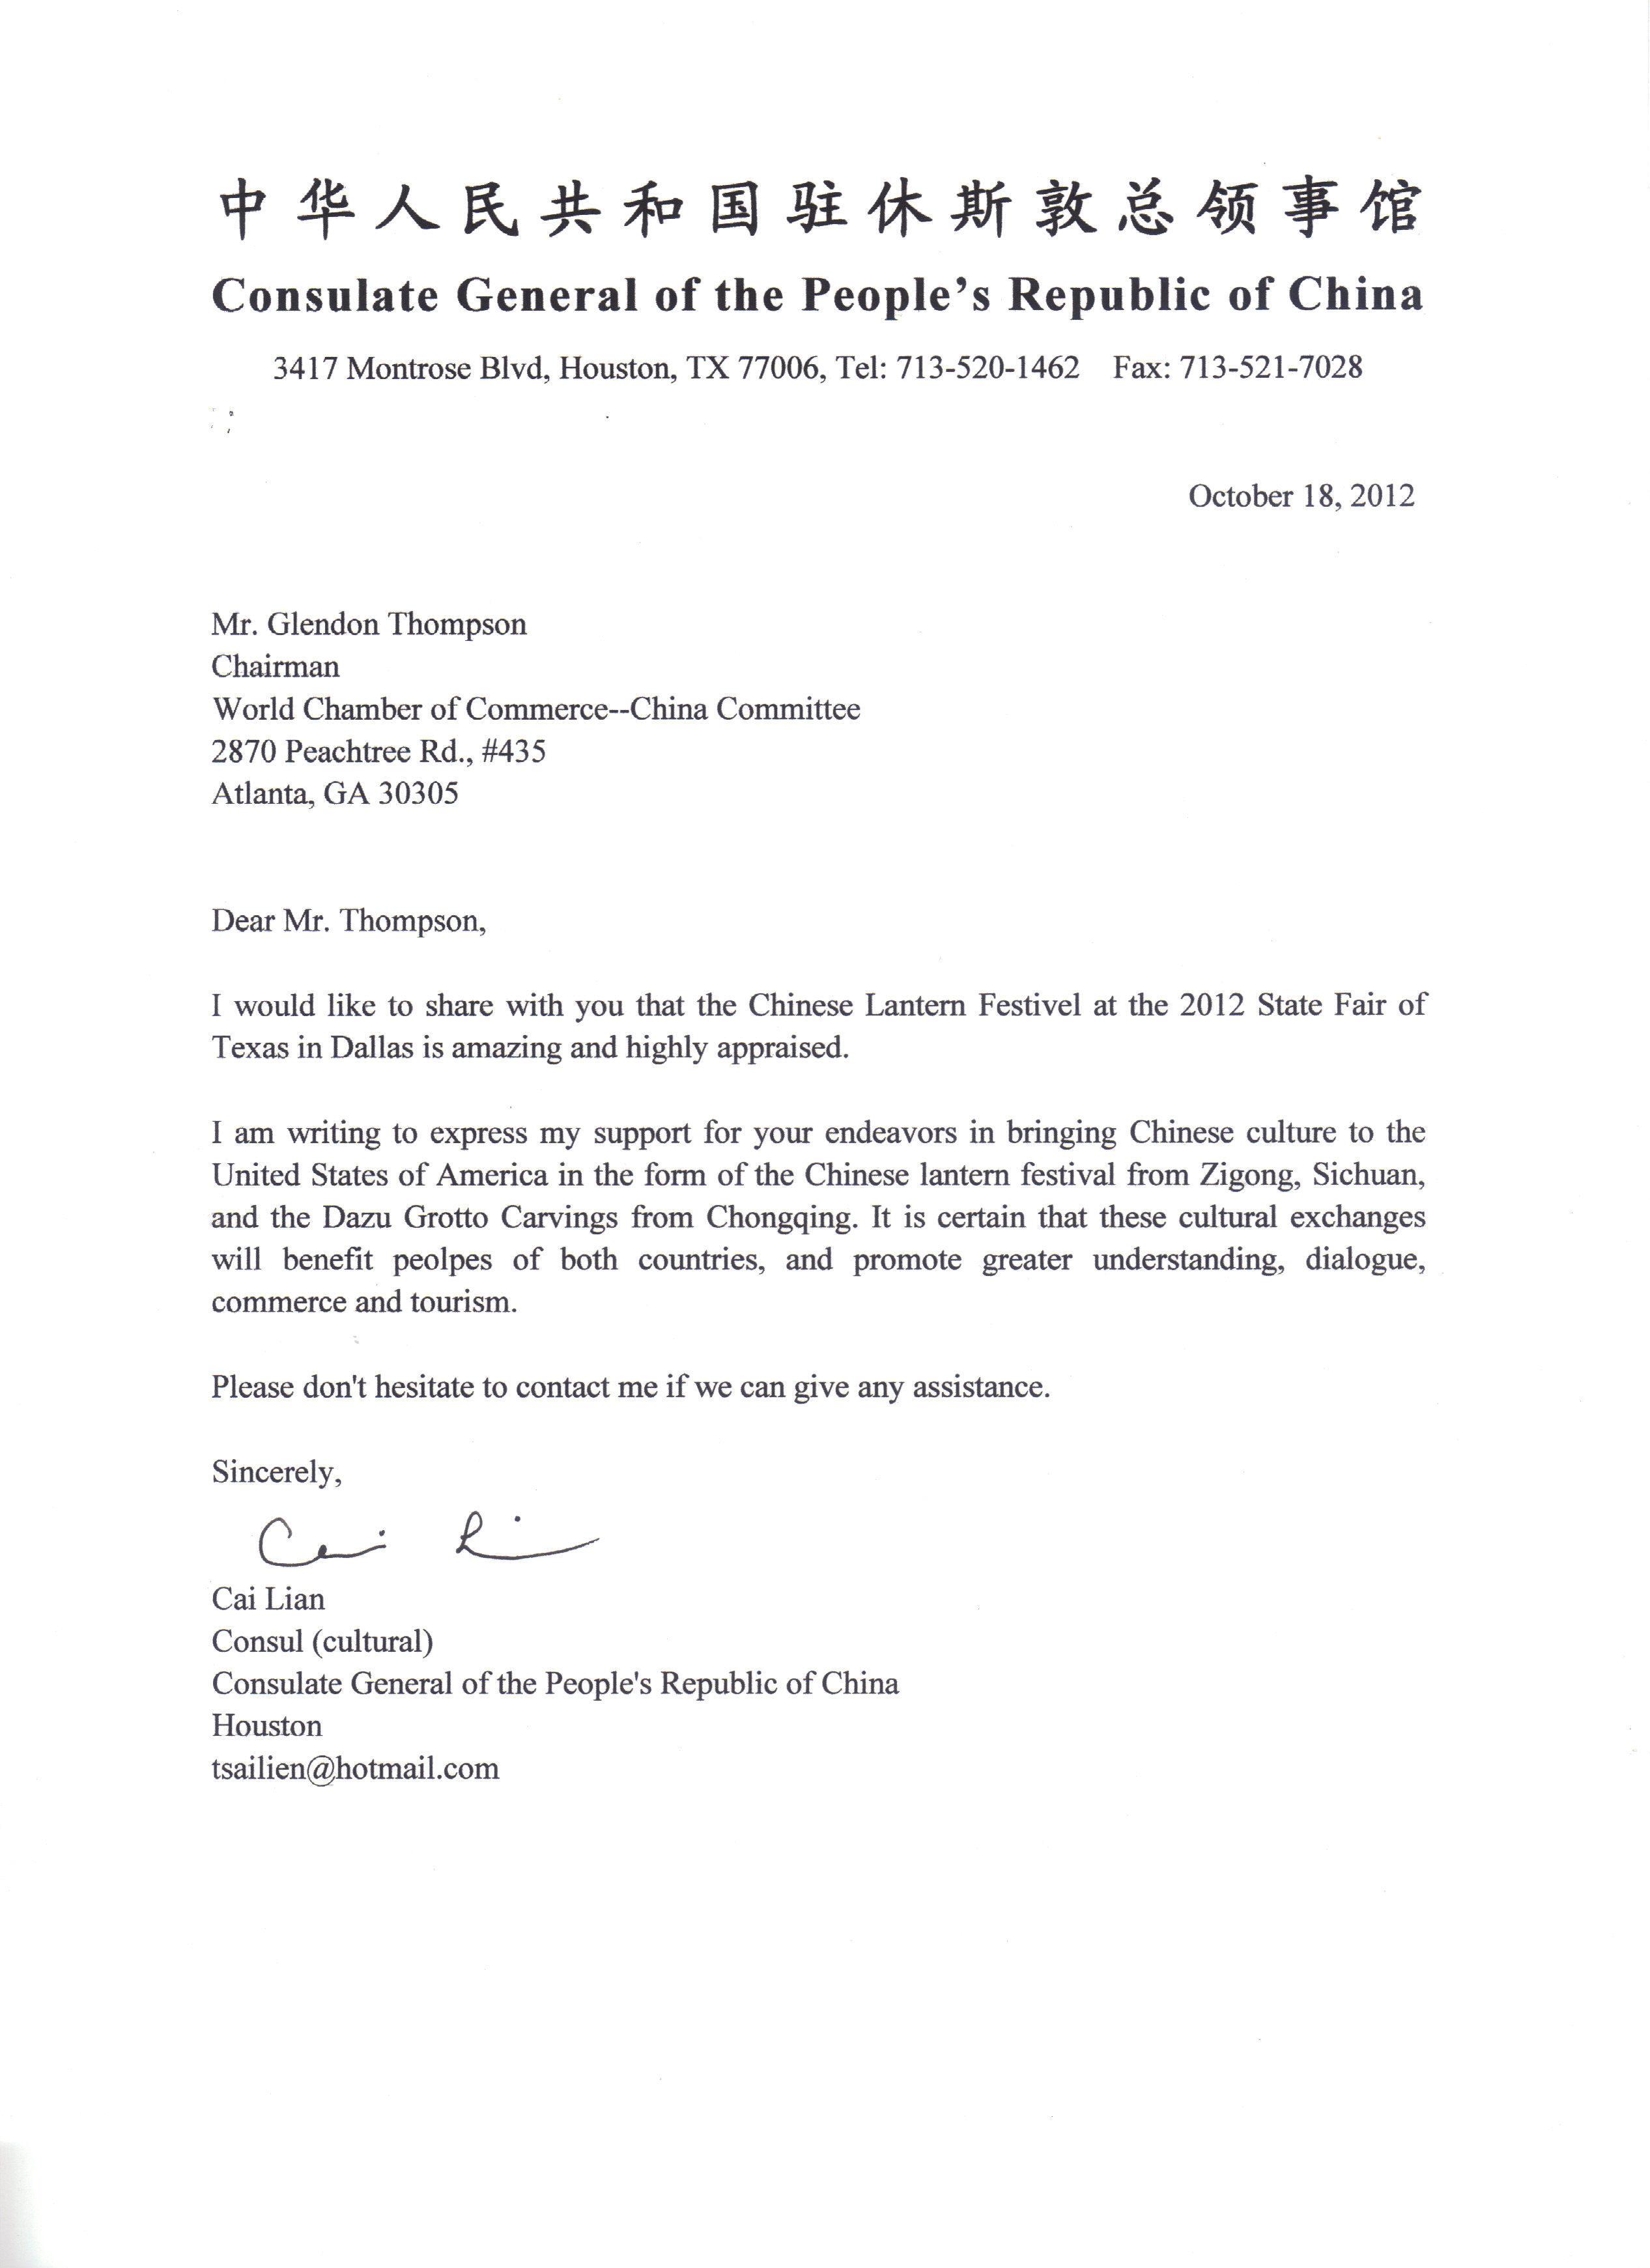 China Visa Invitation Letter is adorable invitation layout